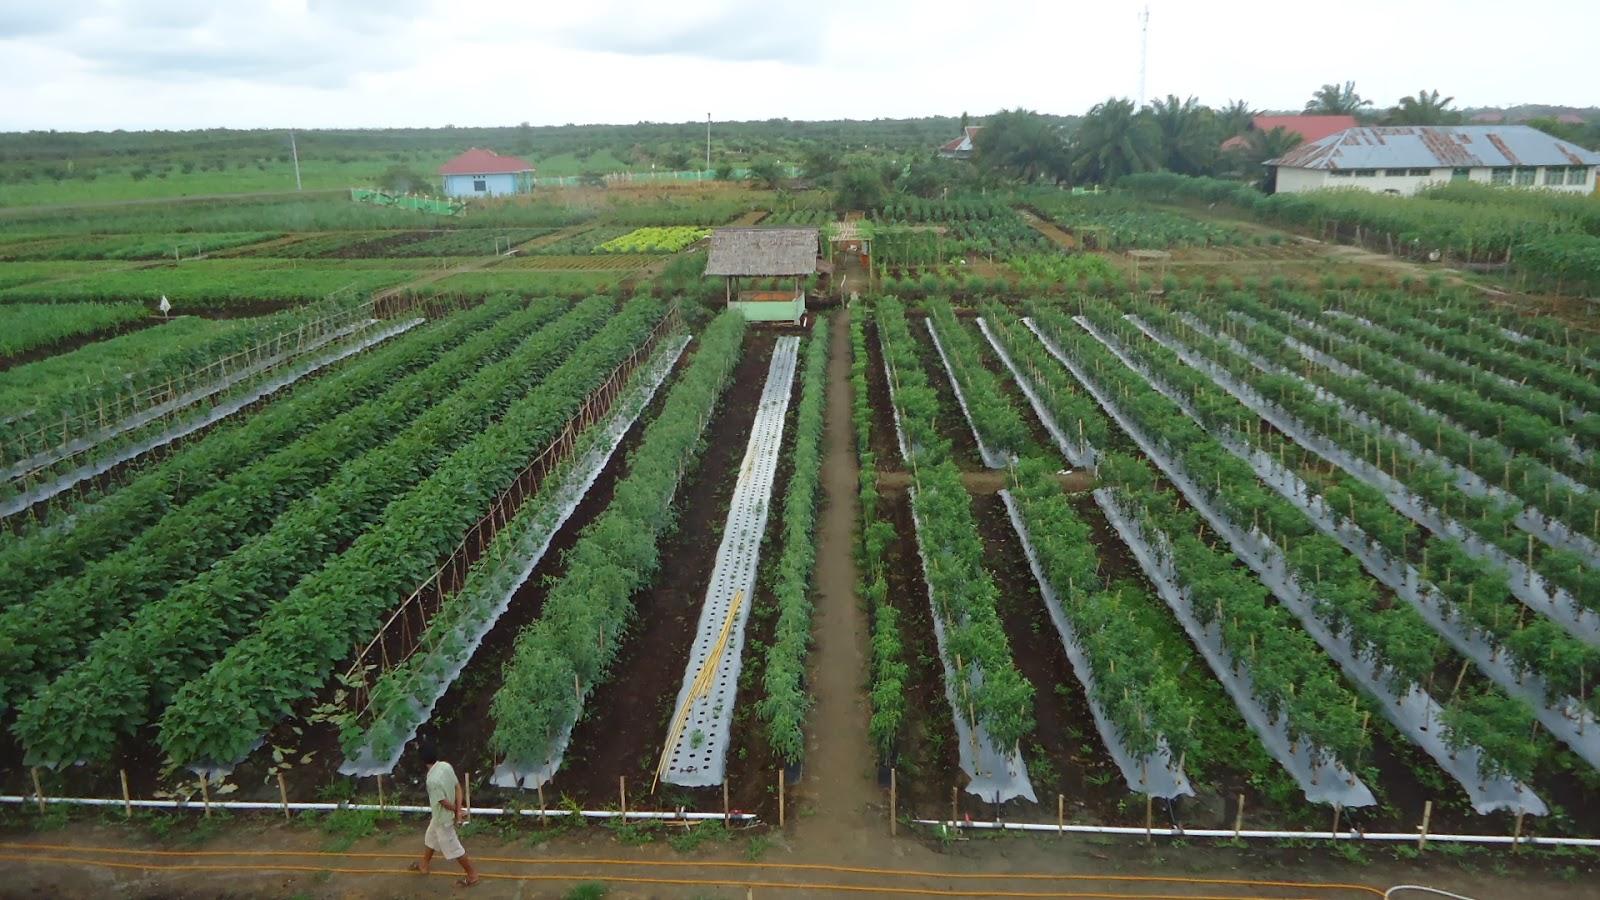 Lembar Informasi Materi Penyuluhan Pertanian Kelapkeliplampune